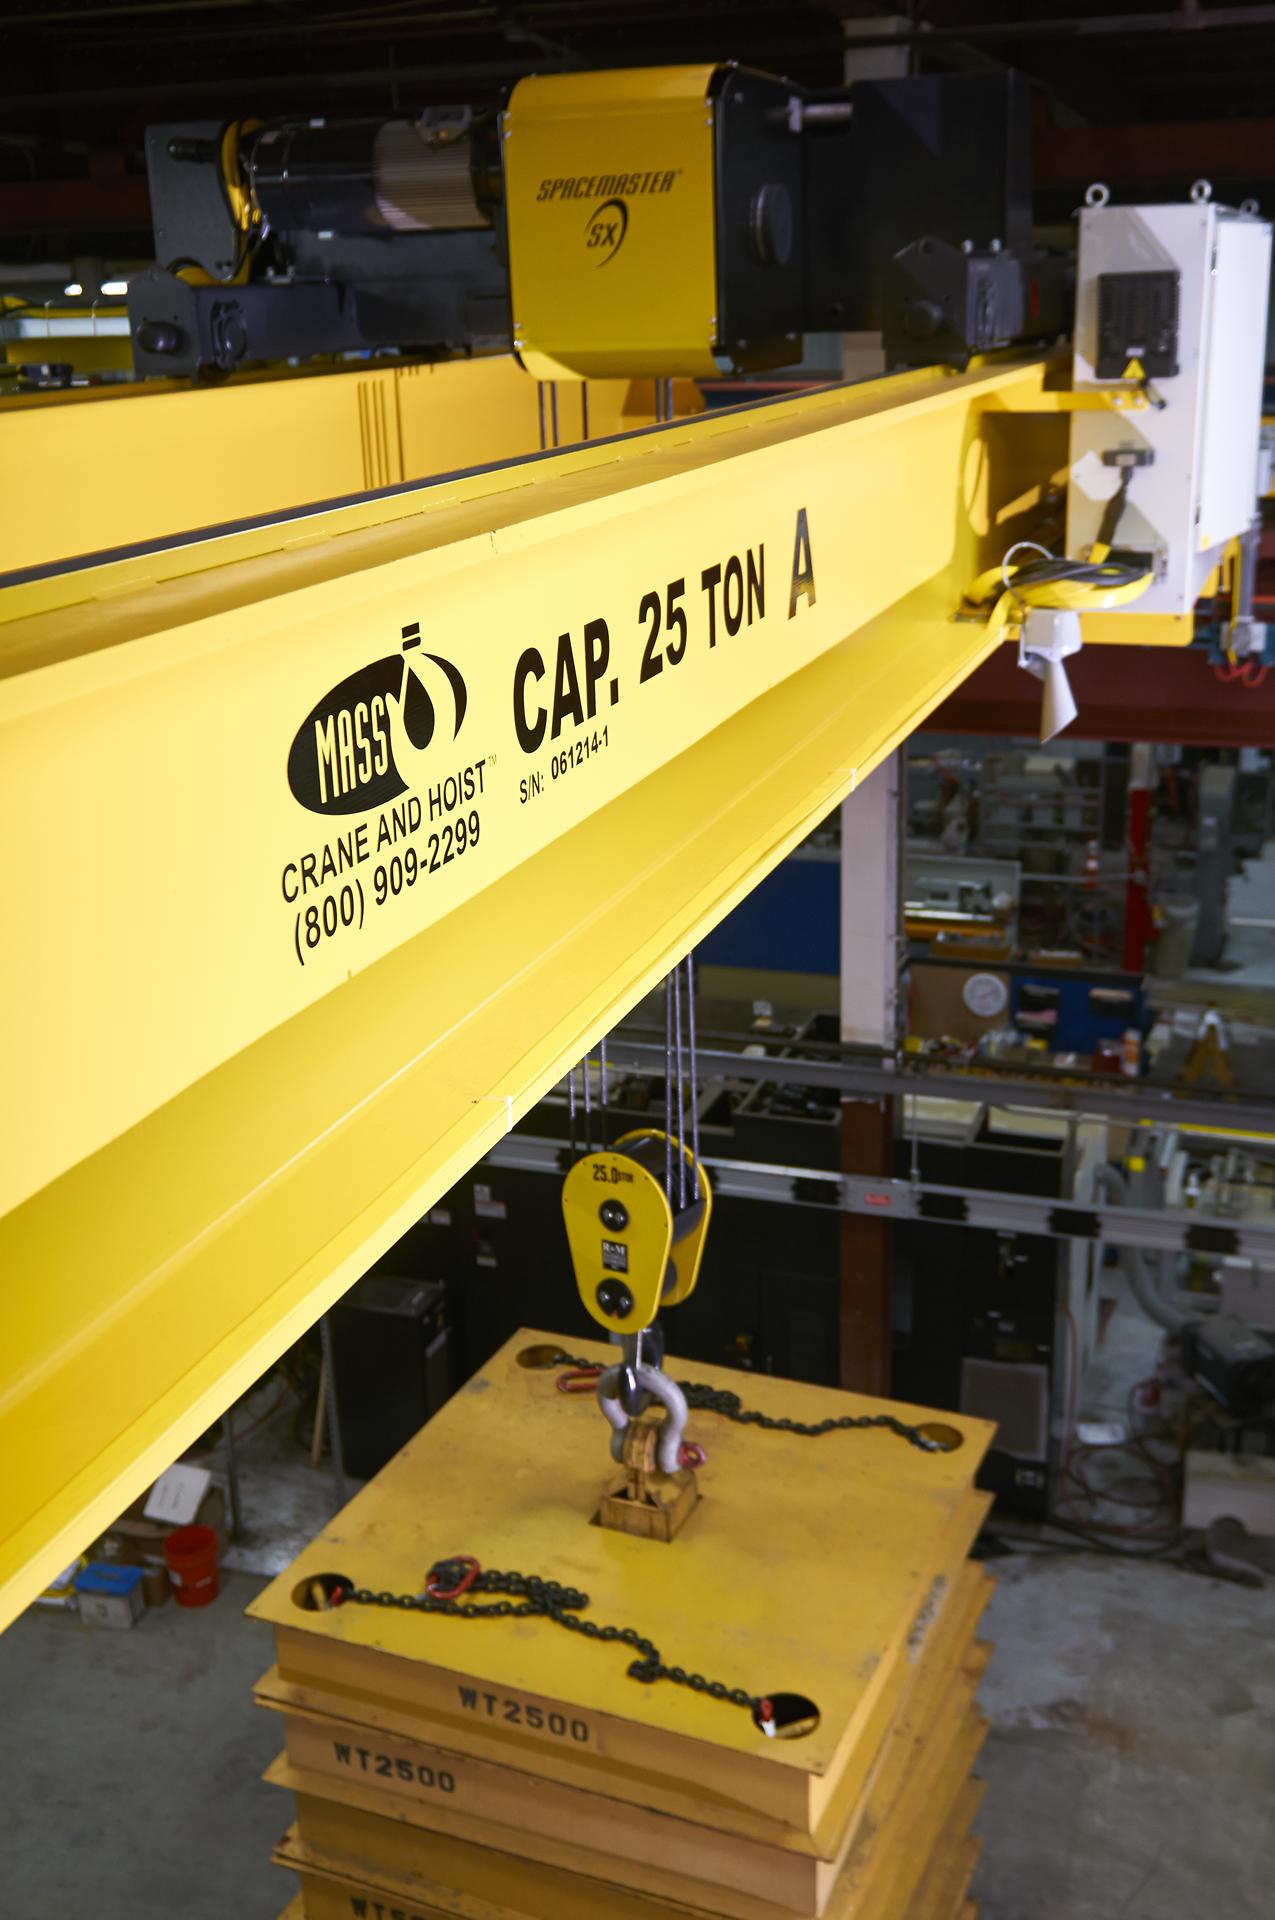 Mass Crane and Hoist - Service and Parts